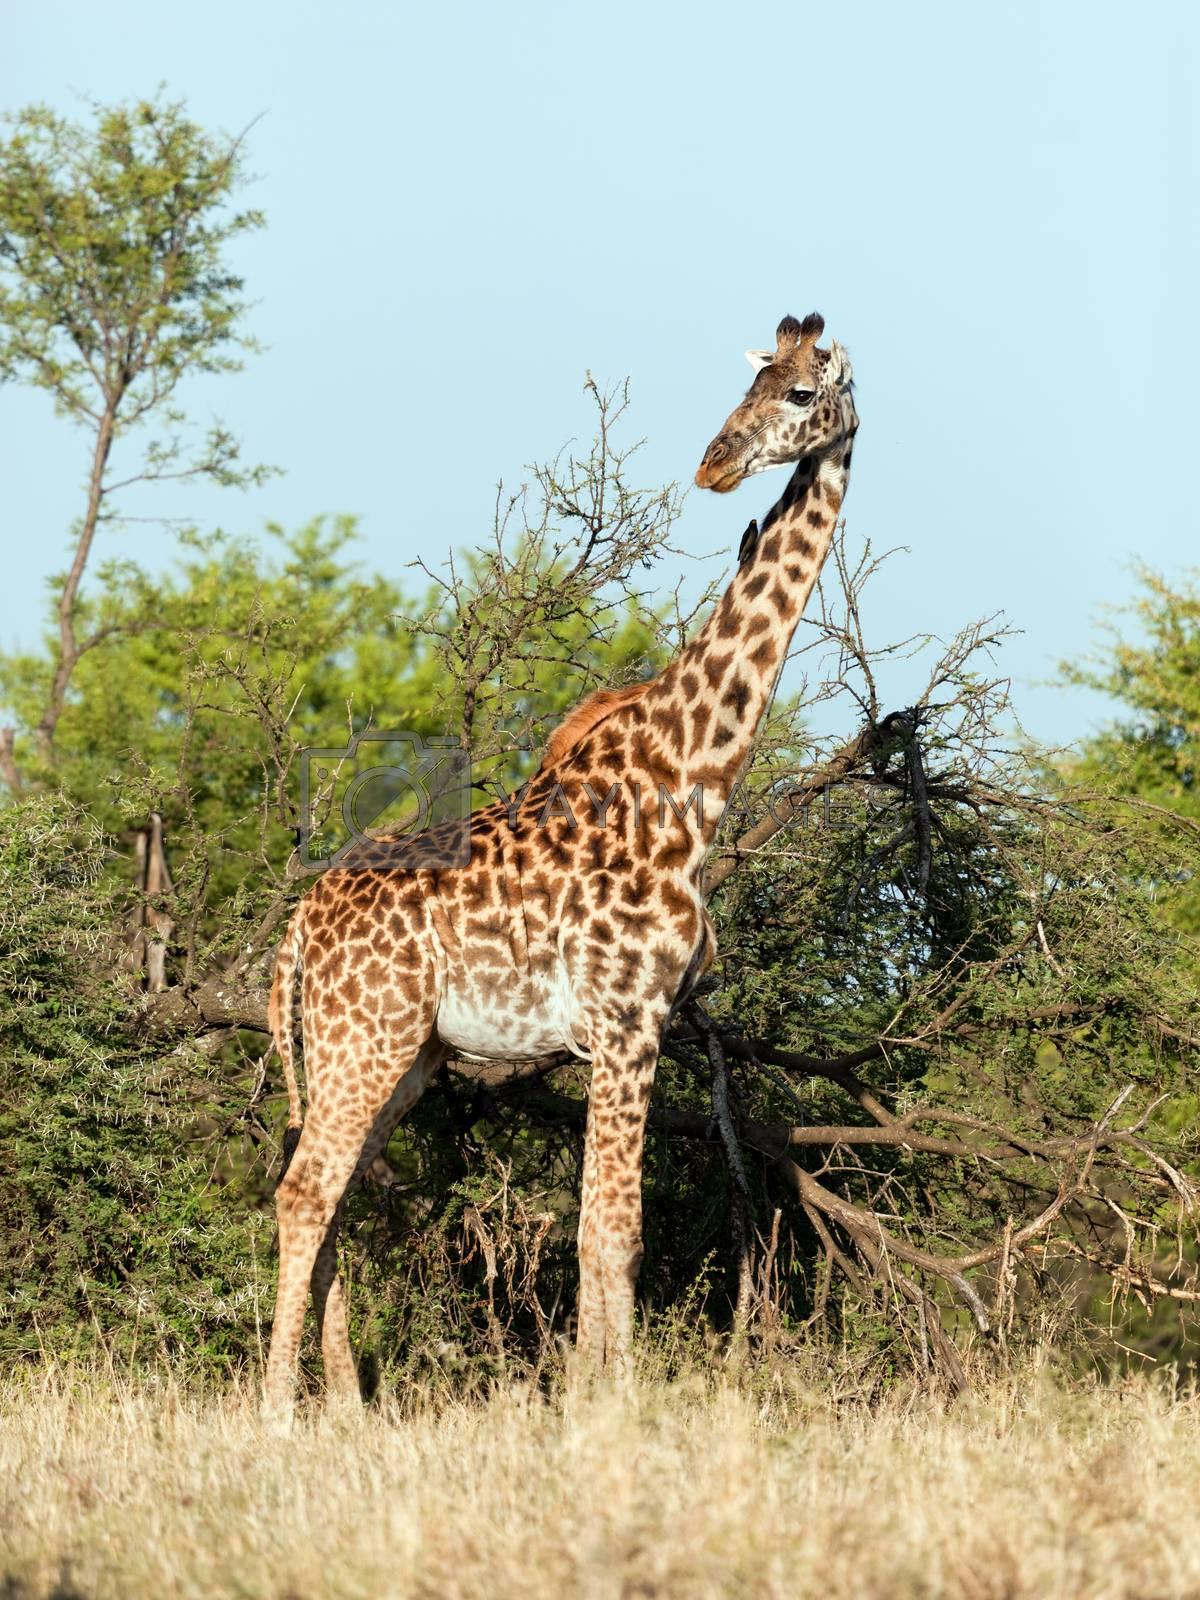 Royalty free image of Giraffe on savanna. Safari in Serengeti, Tanzania, Africa by photocreo